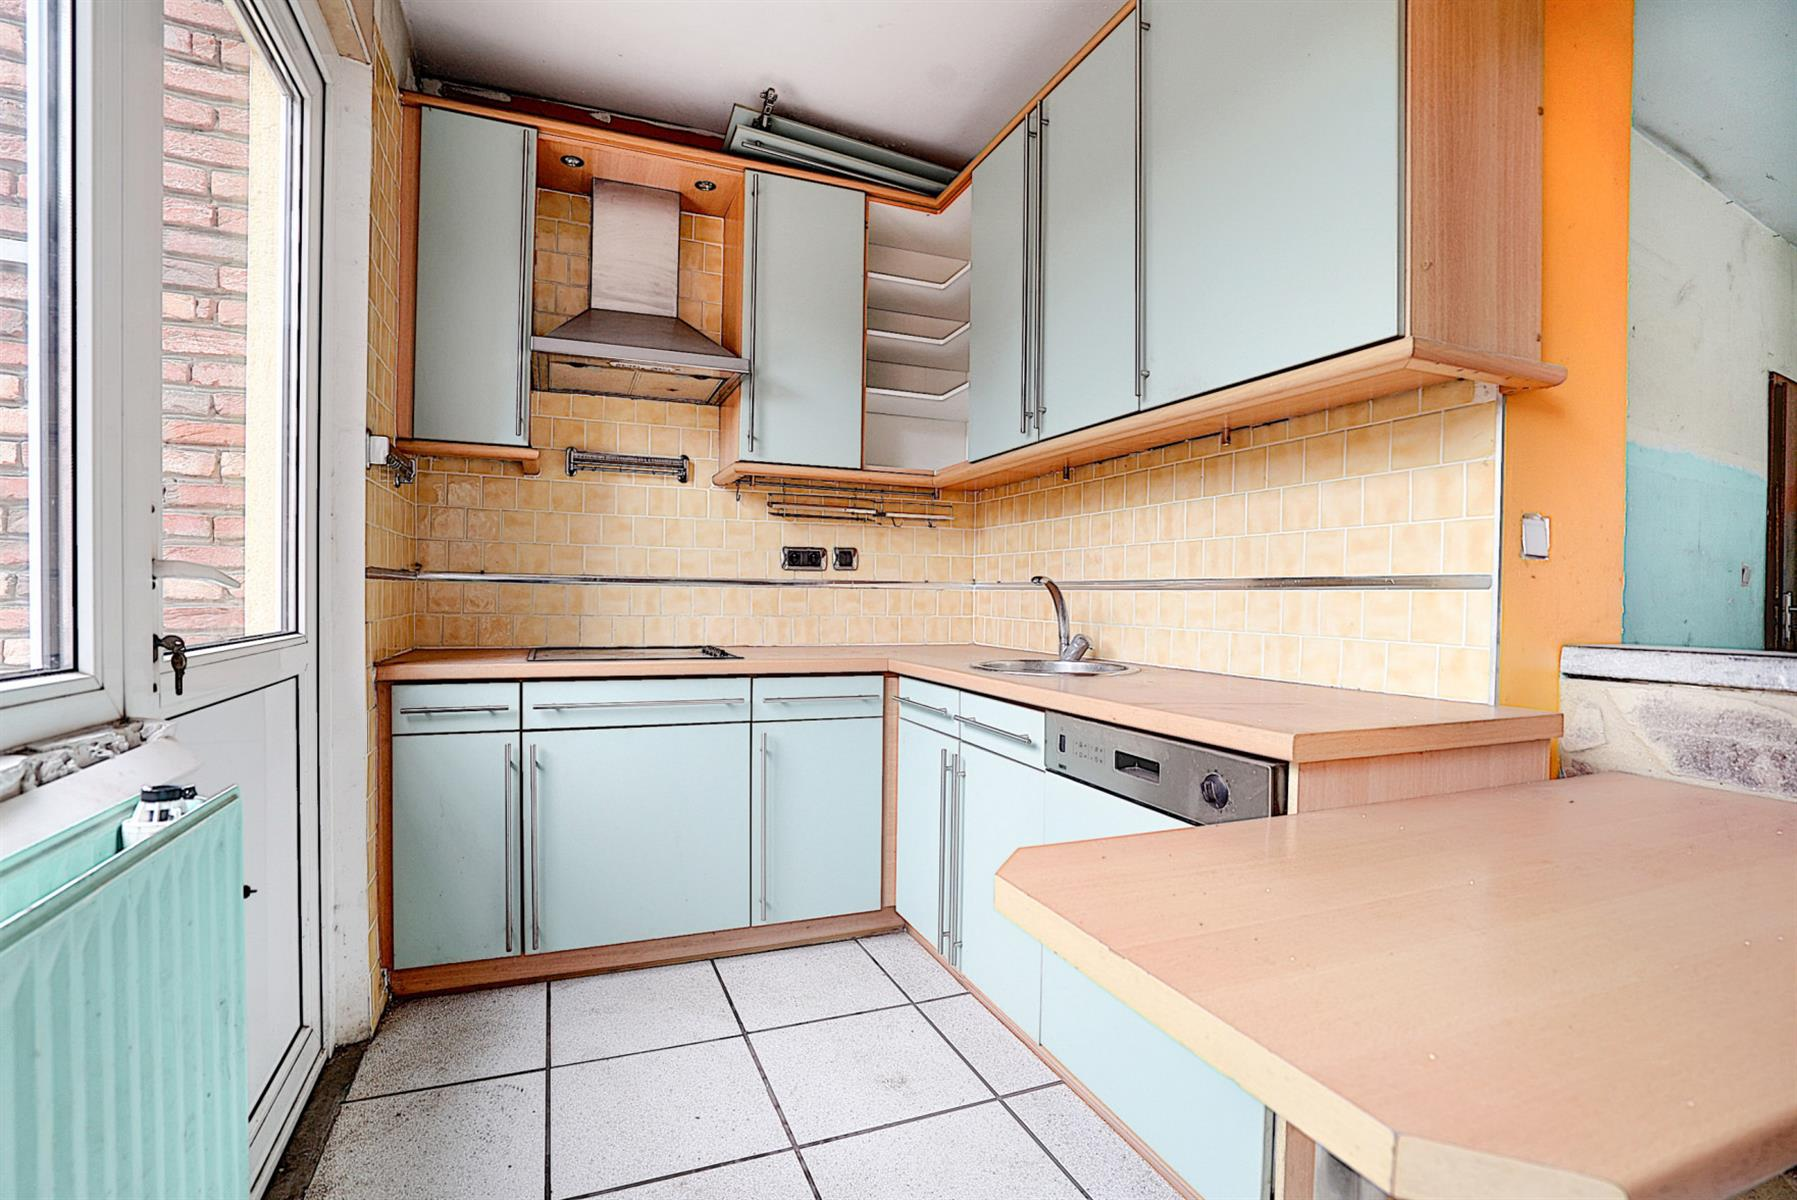 Maison - Saint-nicolas - #4357054-5